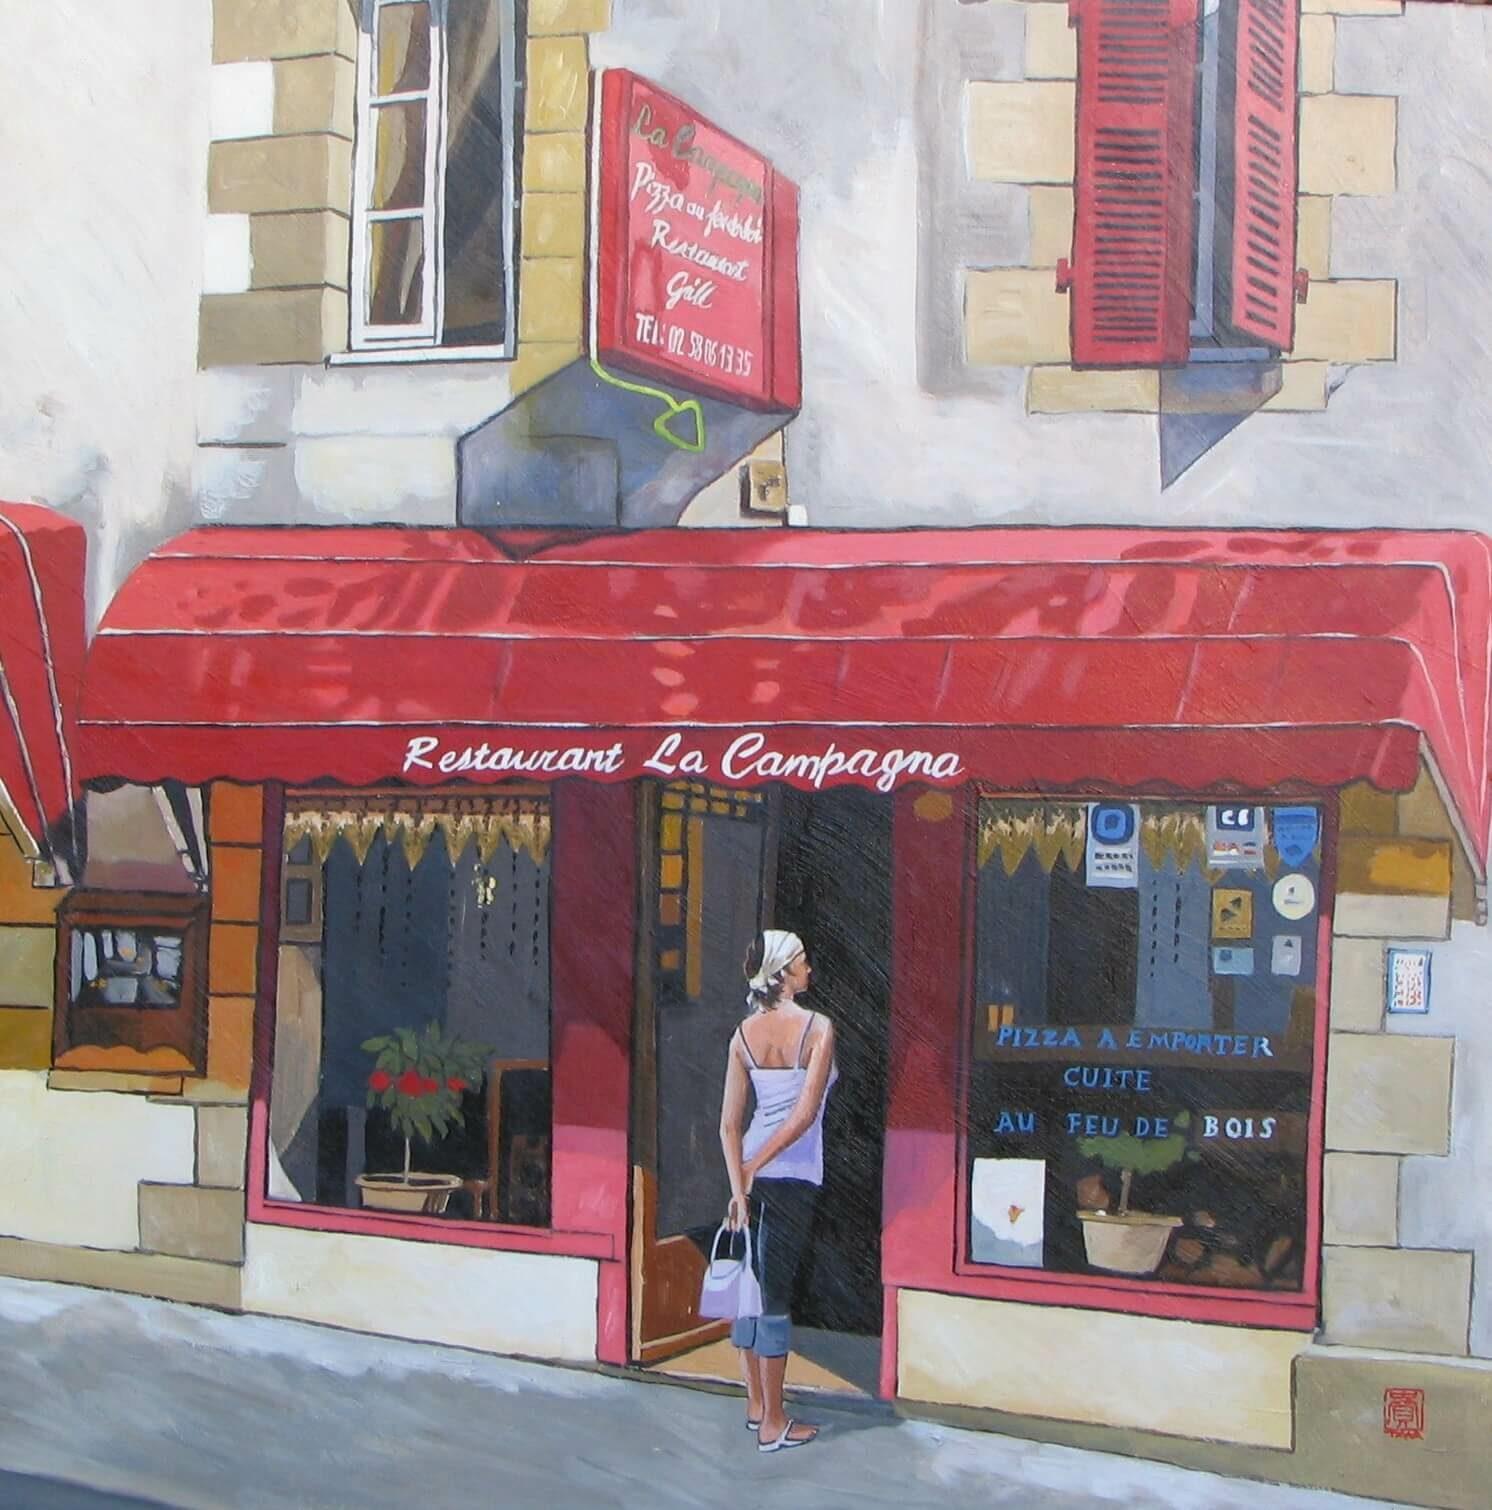 Restaurant La Campagna